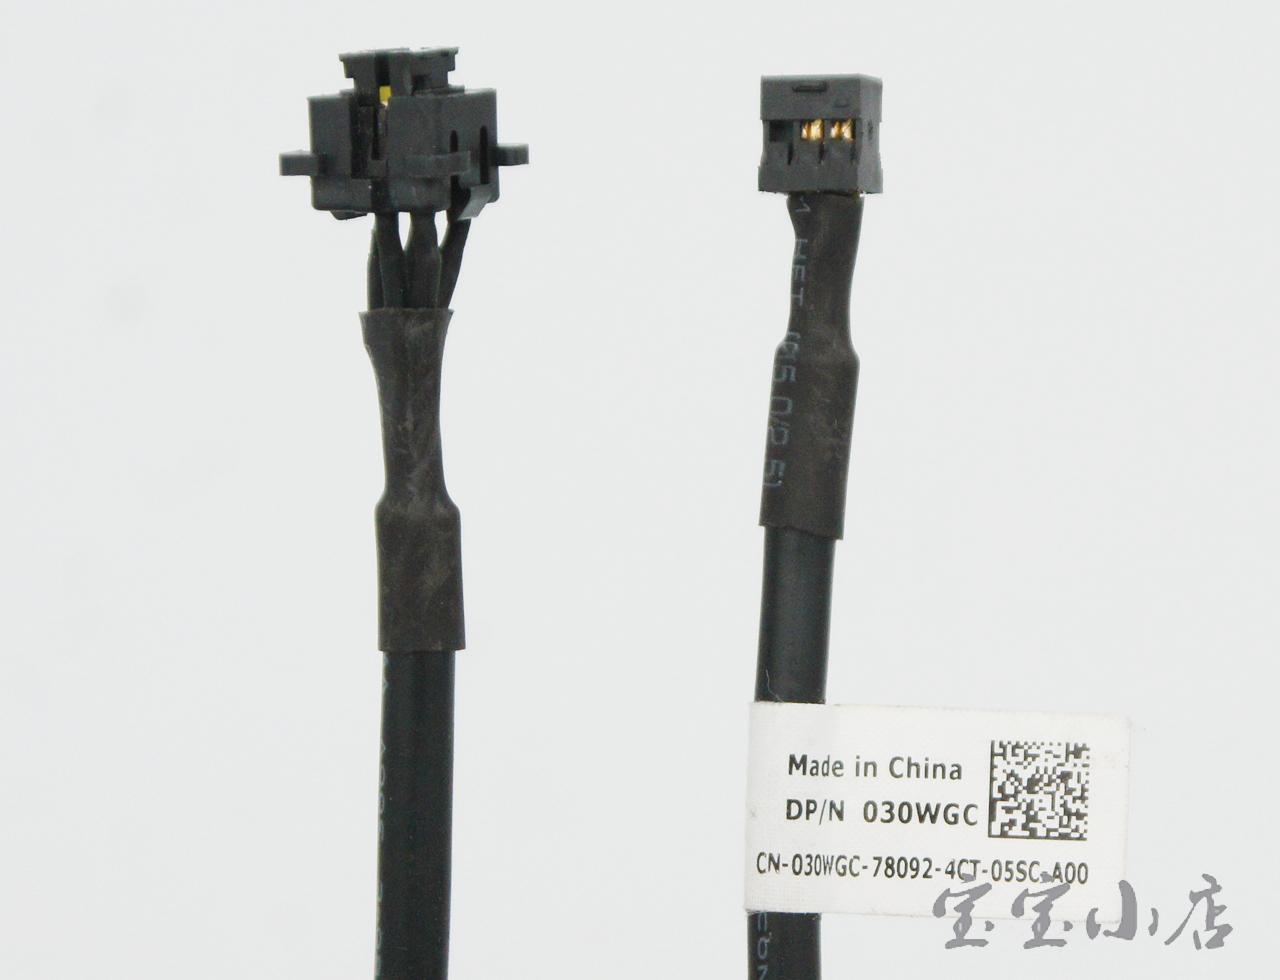 戴尔Dell OptiPlex 7010 9010 7020 9020 XE2 MT PC Power Button Switch 30WGC Cable 开关排线 电源开关线